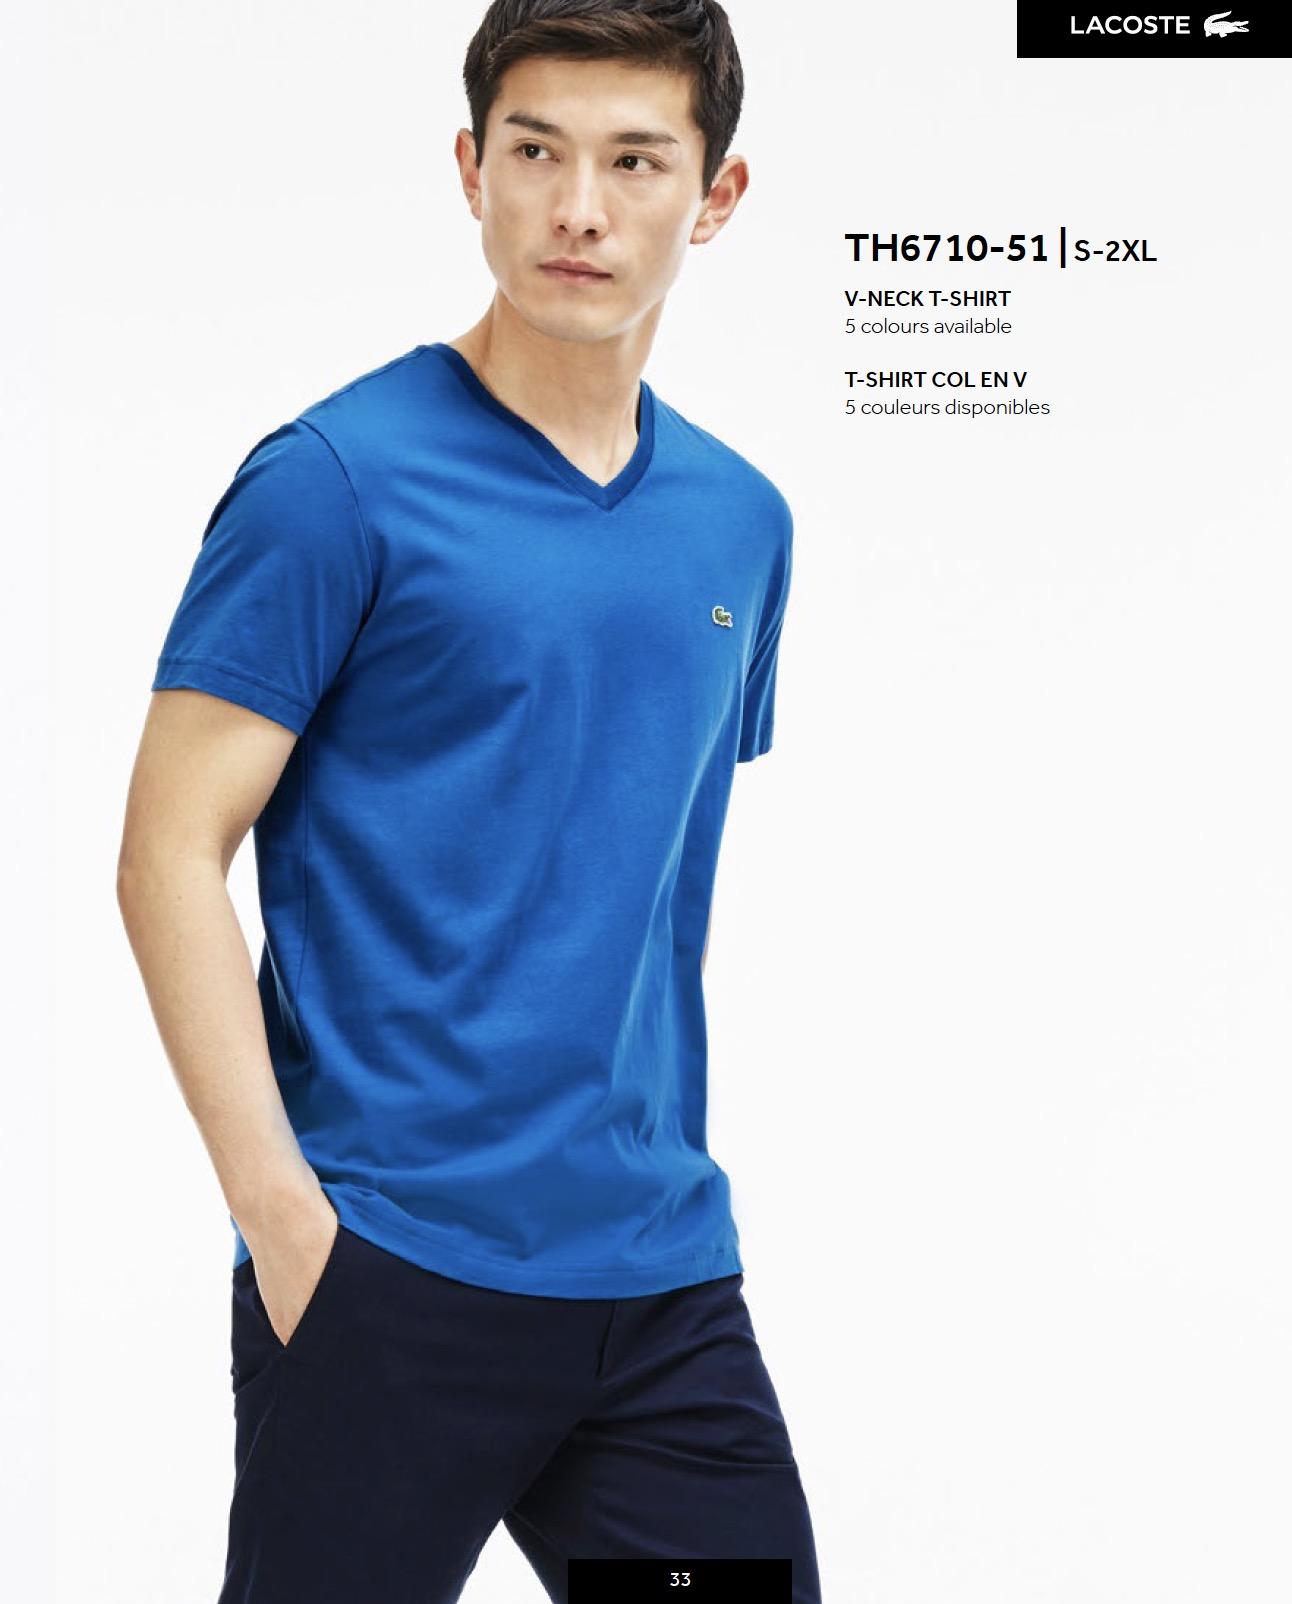 TH6710-51